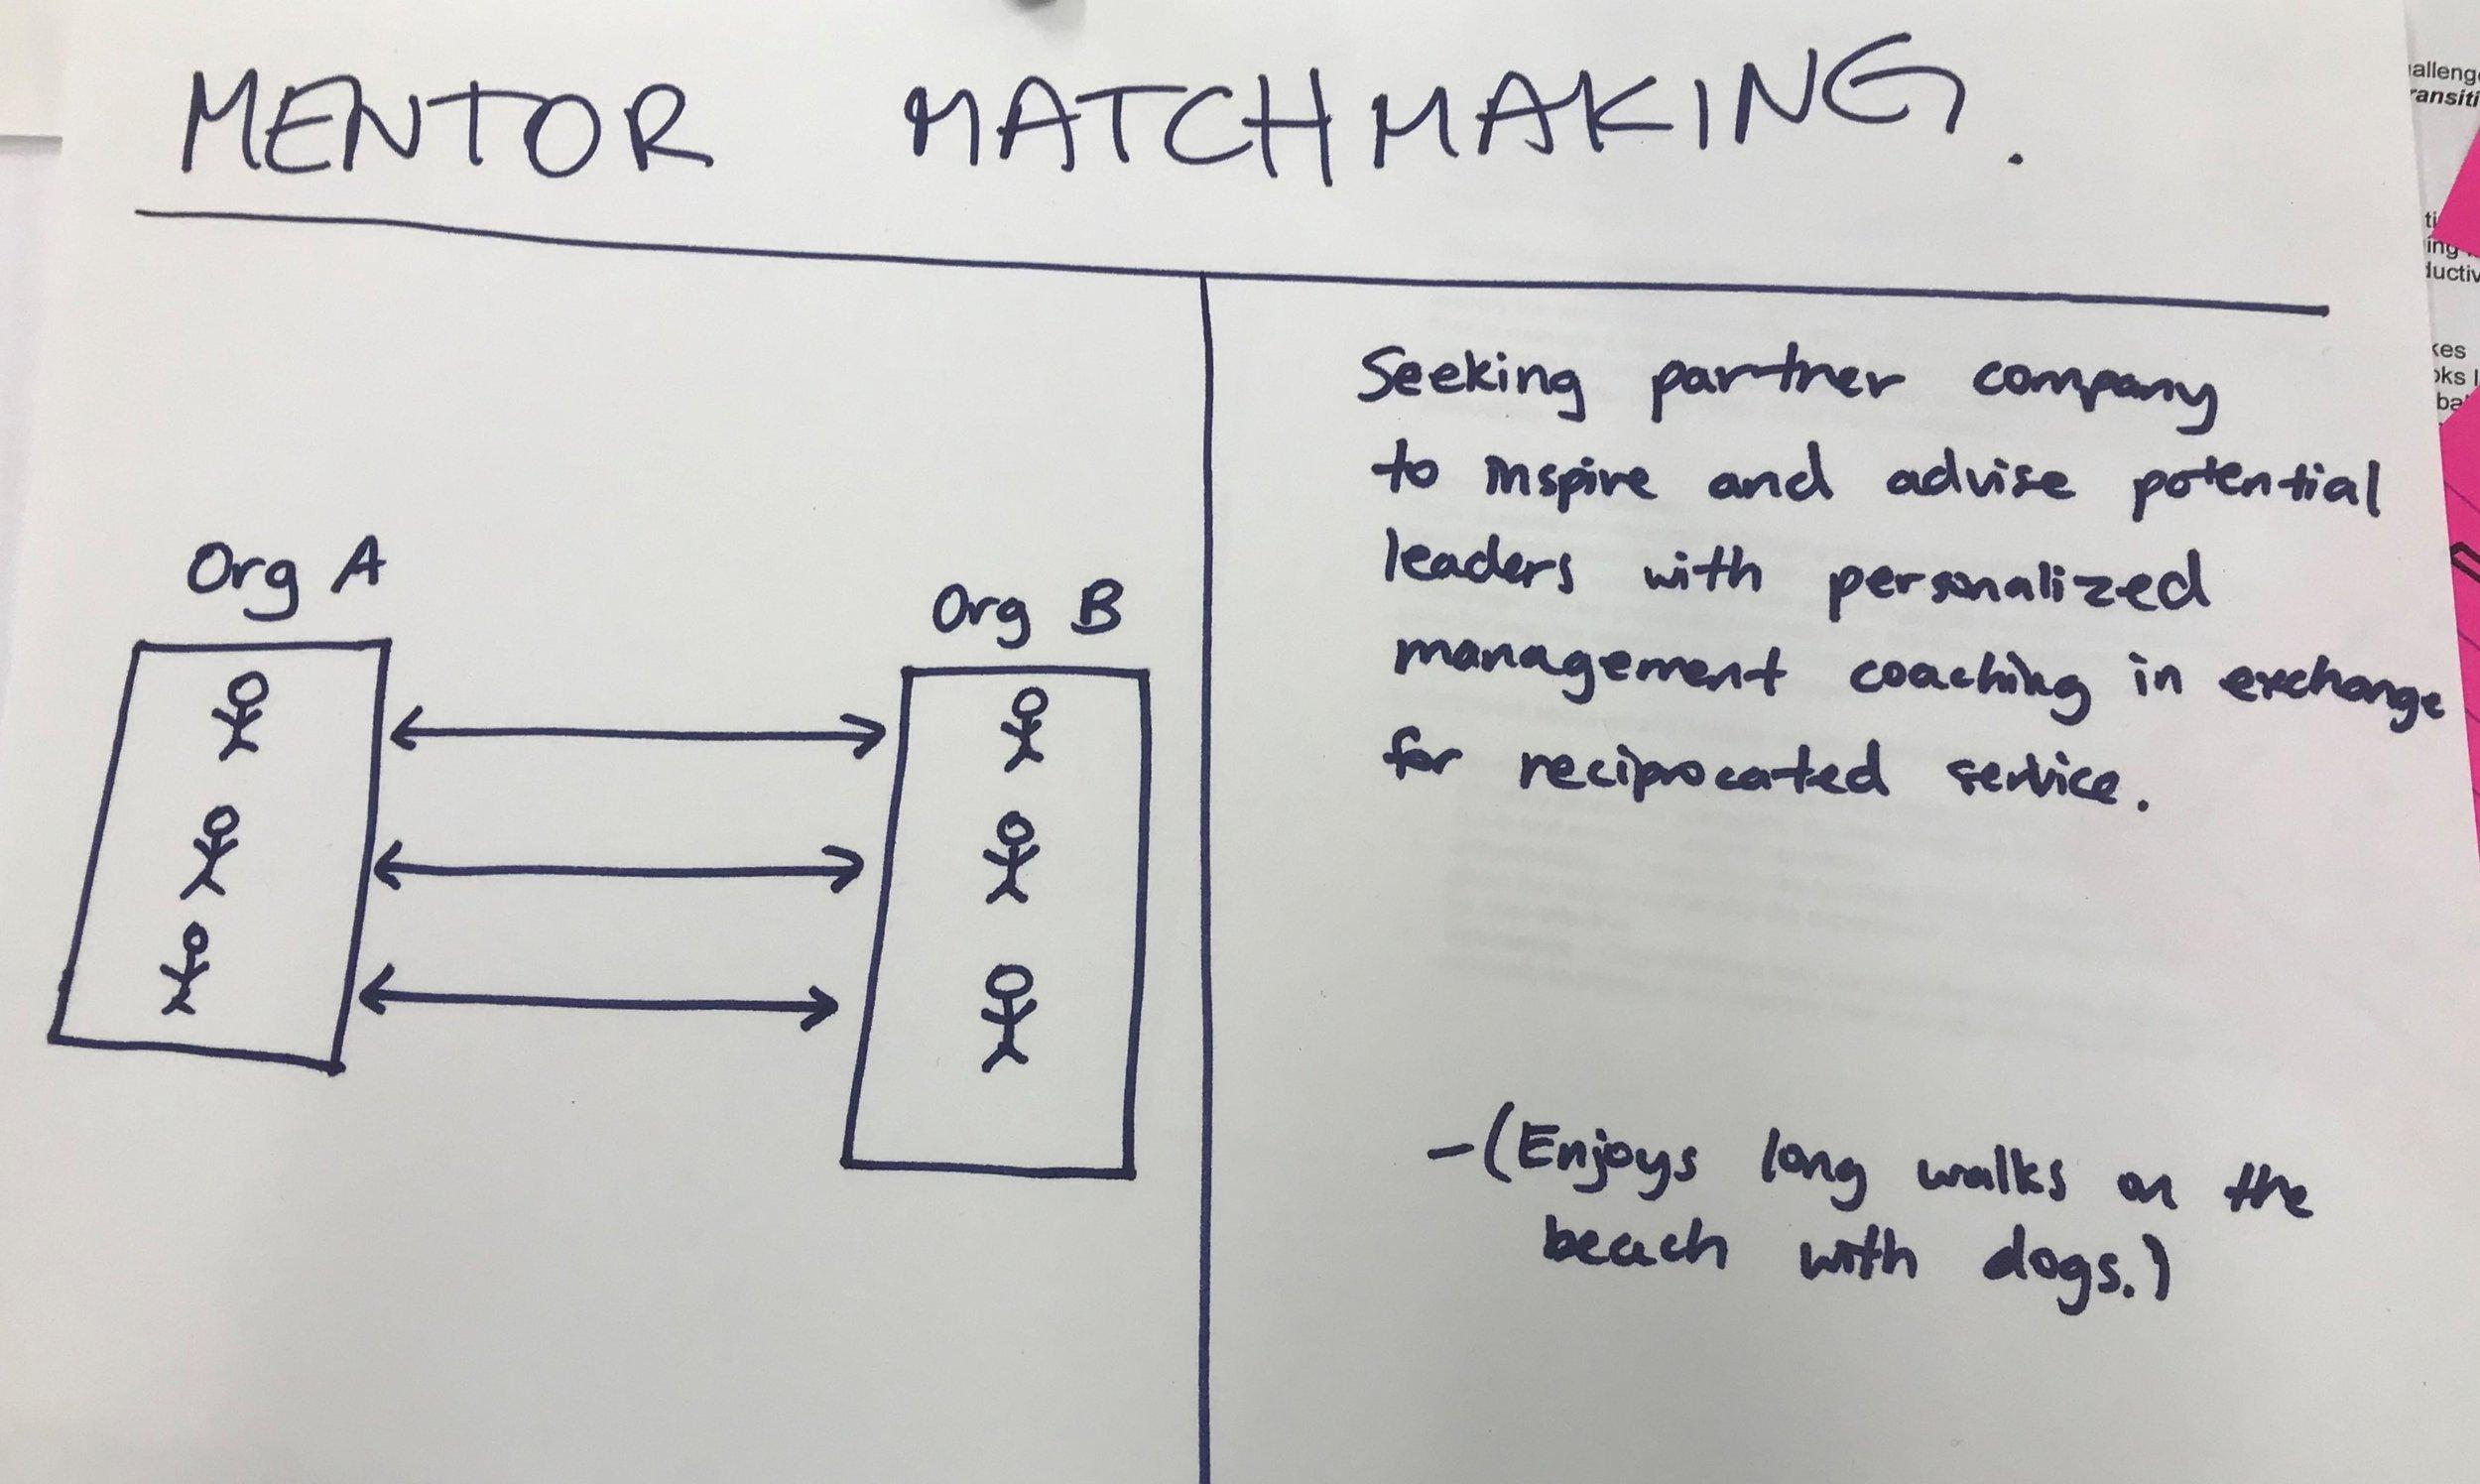 Mentor Matchmaking